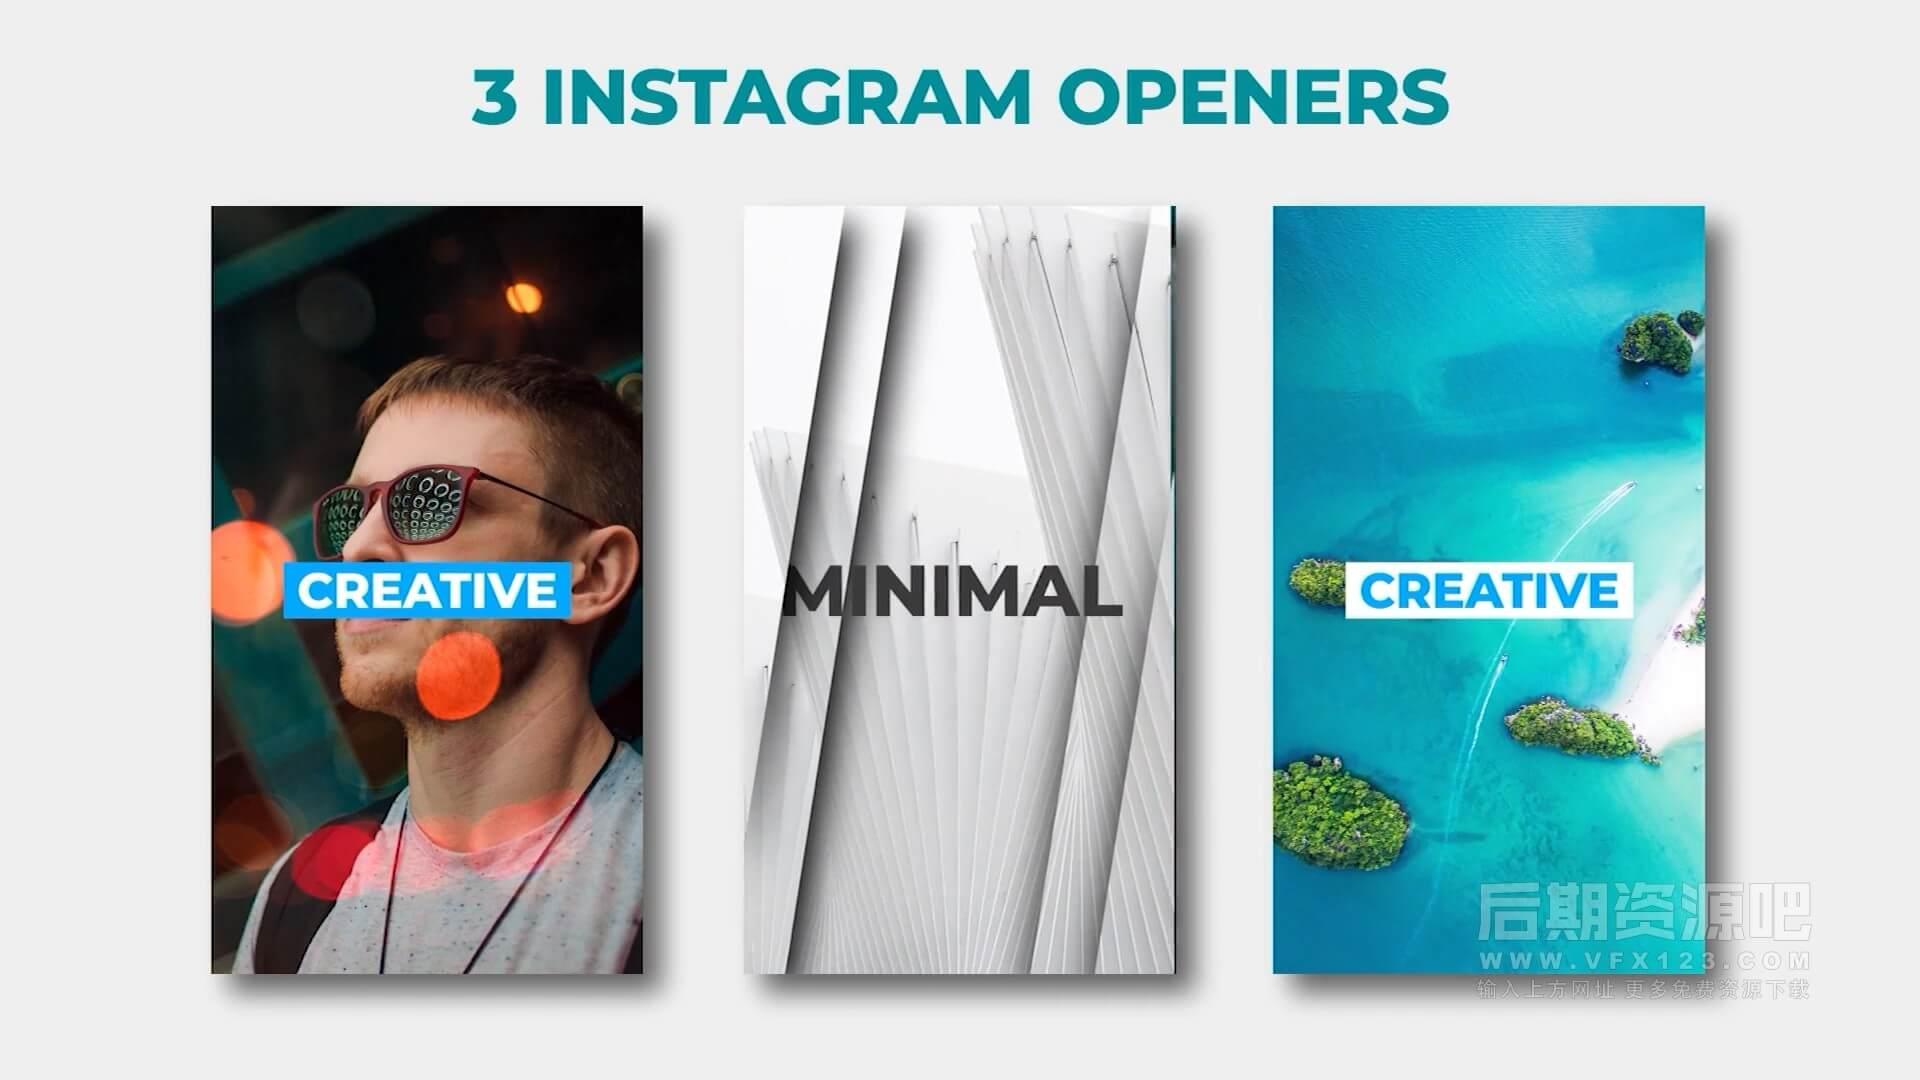 fcpx插件 30组手机竖屏方屏抖音快手短视频模板 Instagram Stories Pack